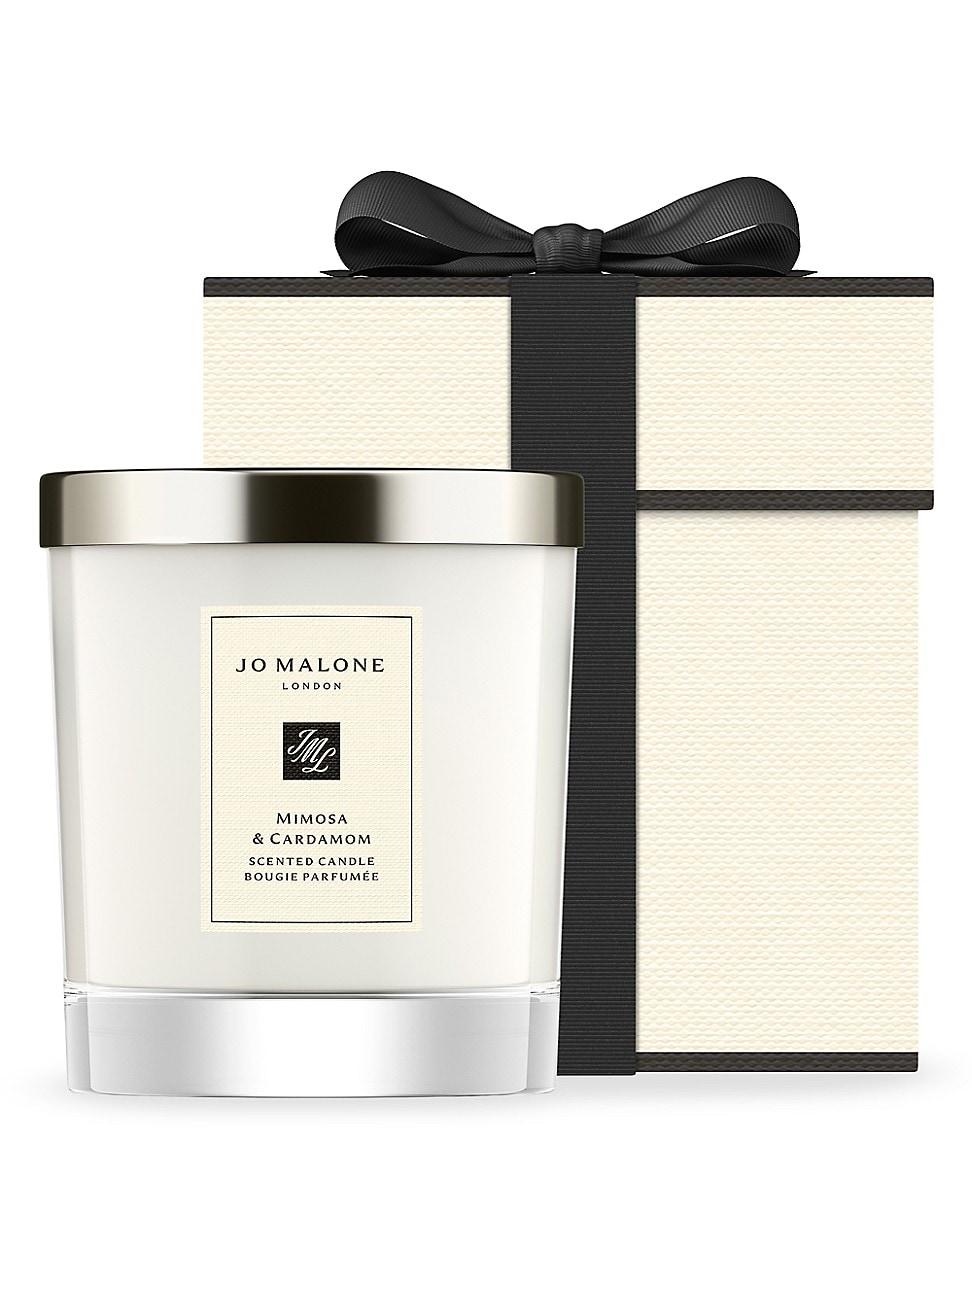 Jo Malone London English Pear & Freesia Candle 7.0 oz/ 200 G Candle